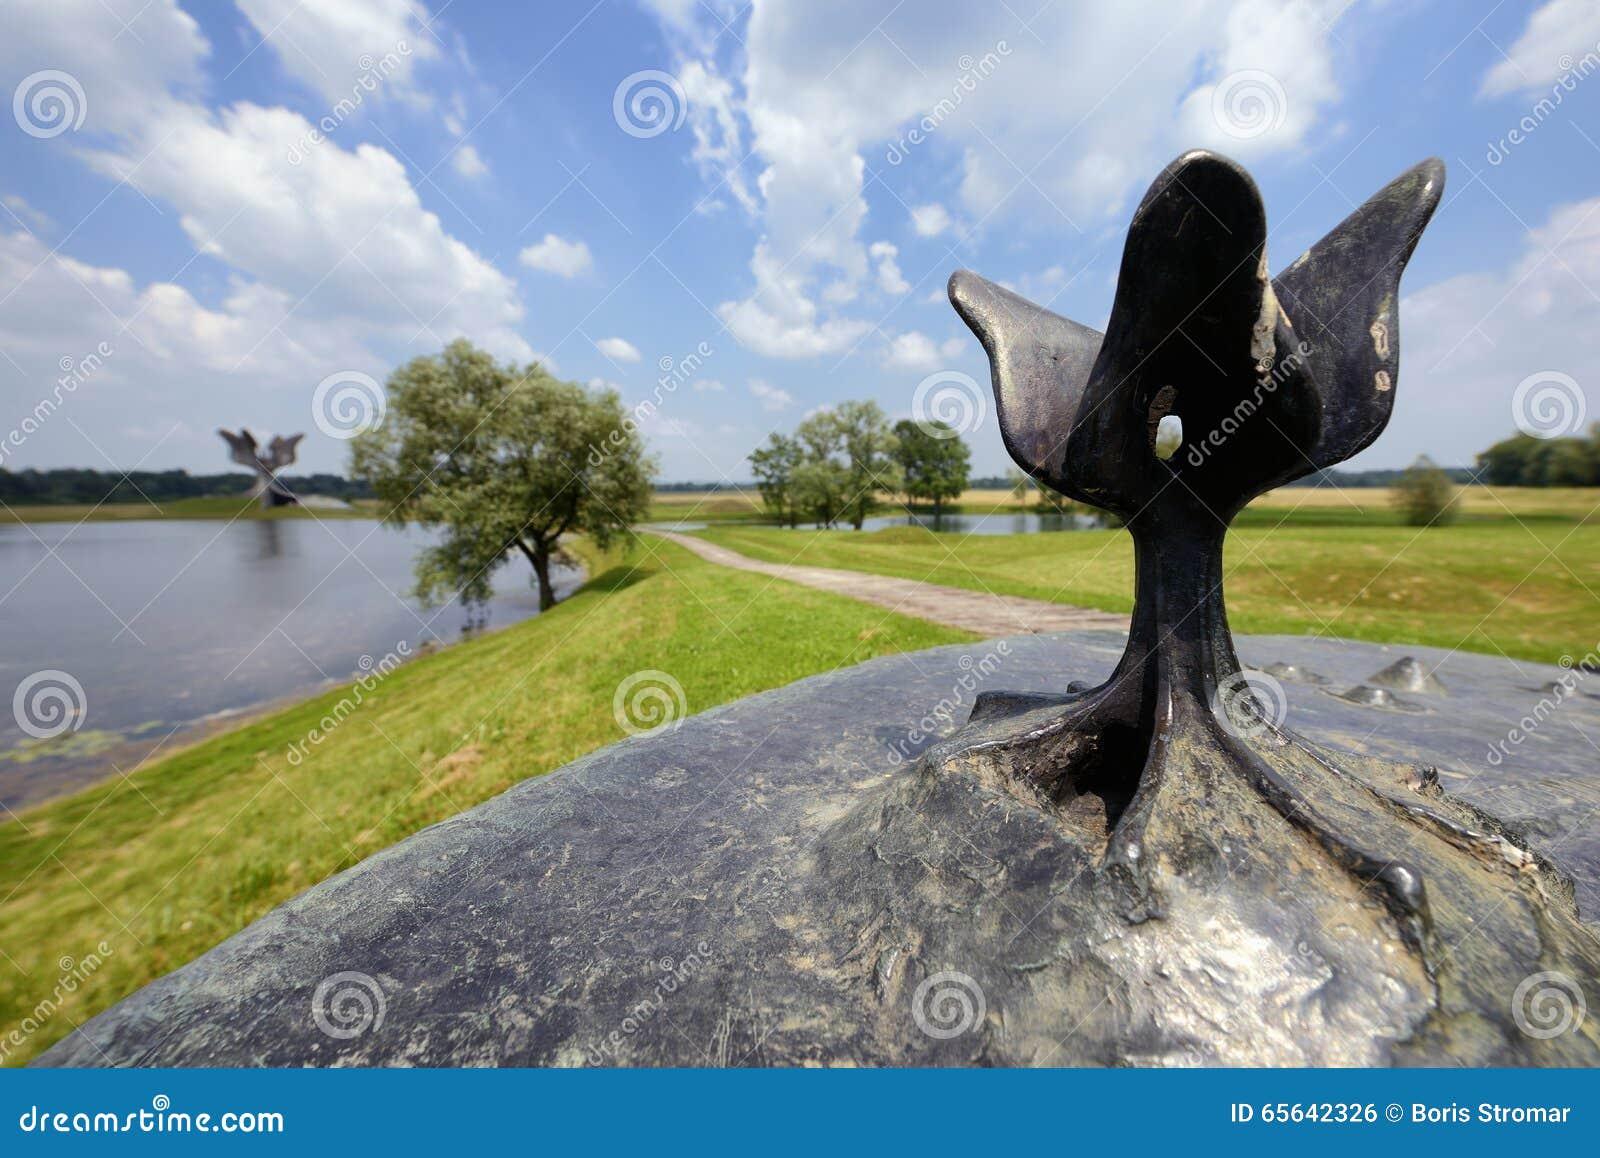 Mémorial de Jasenovac WWII, Croatie